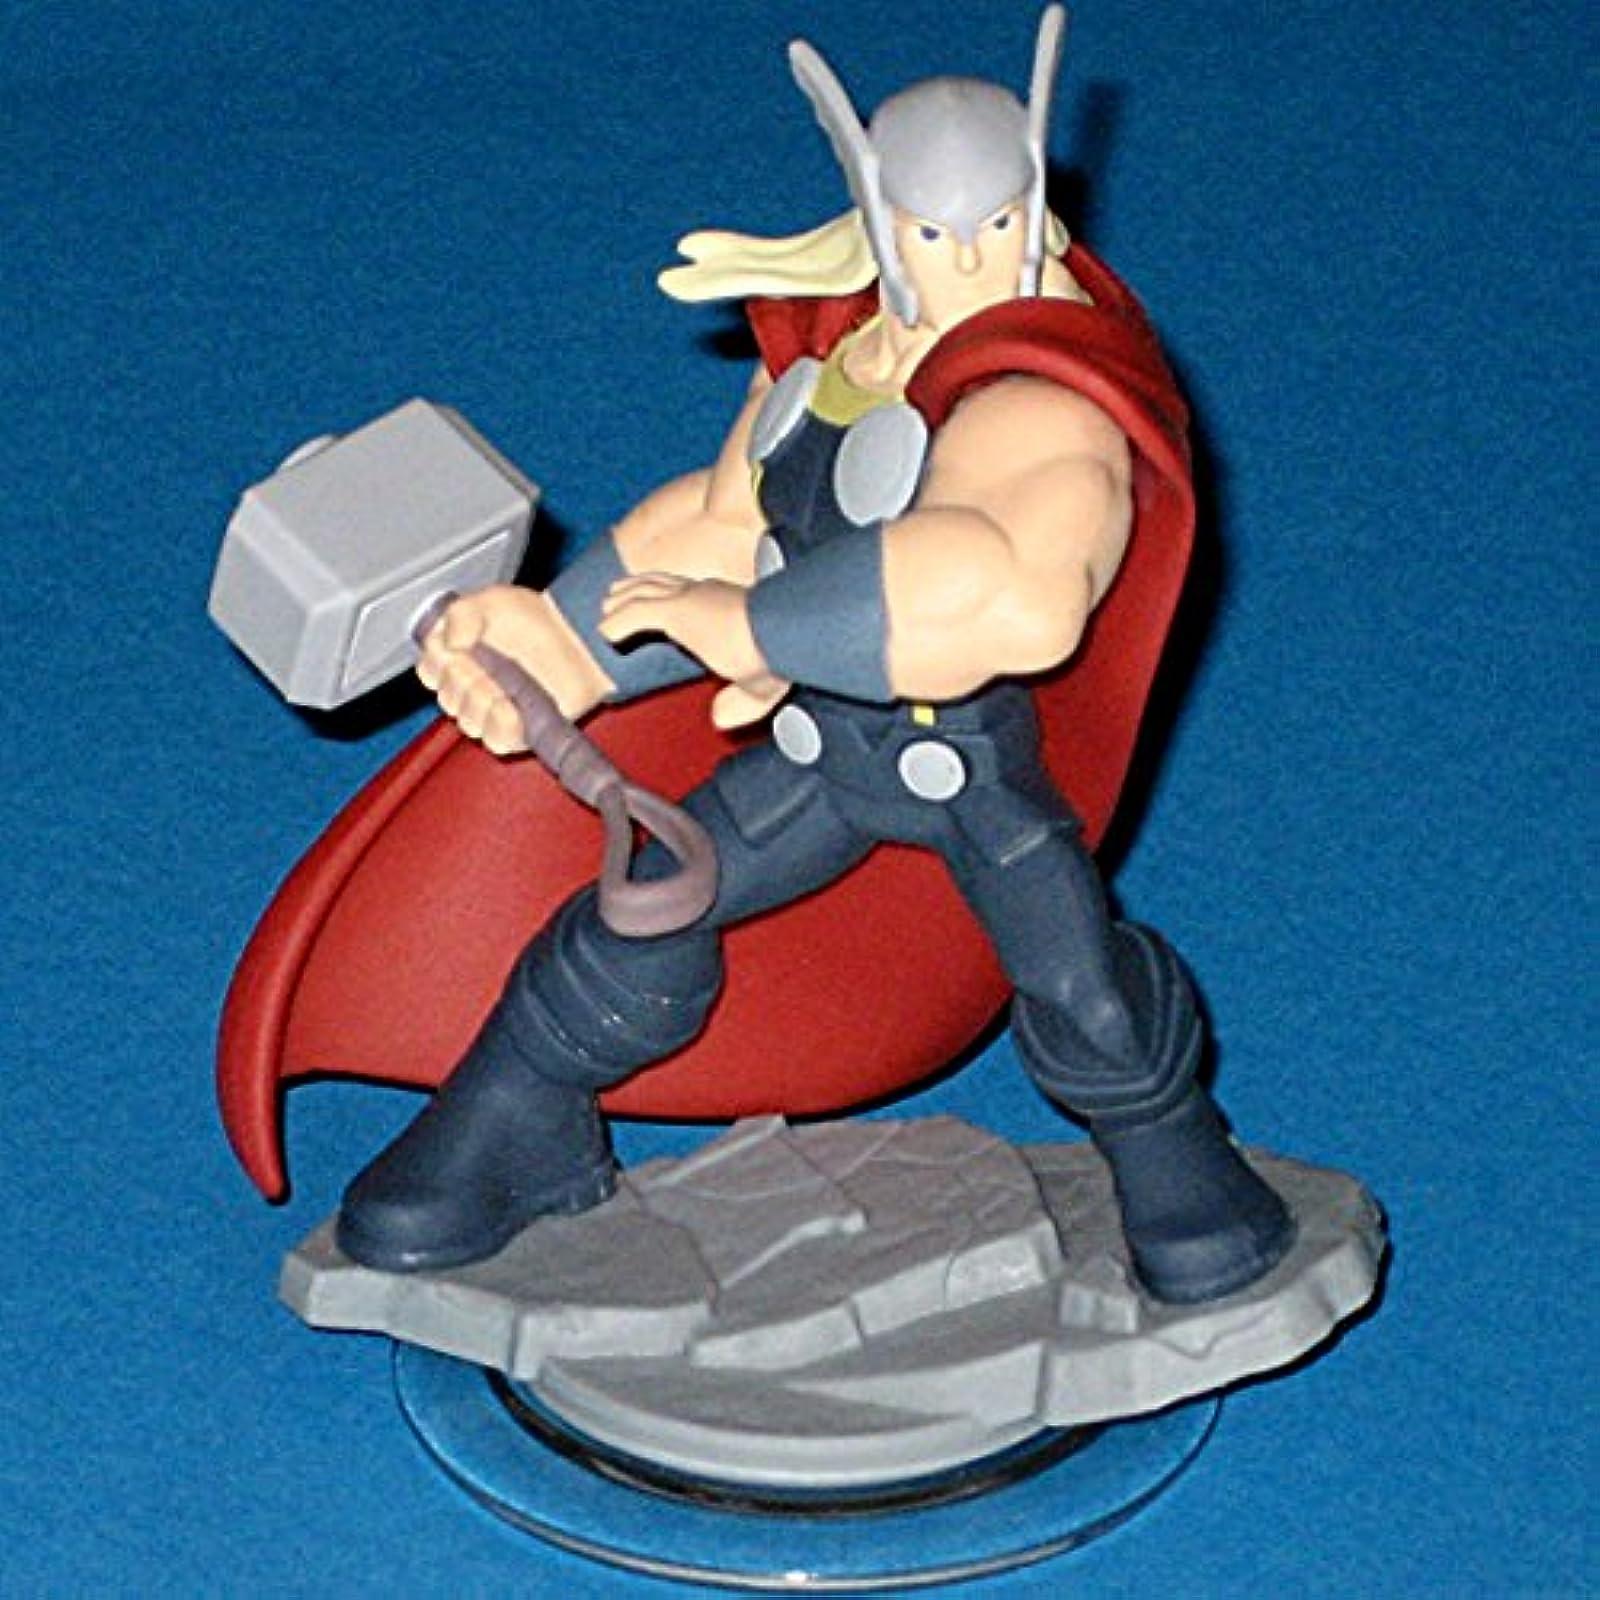 Disney Infinity: Marvel Super Heroes 2.0 Edition Thor Figure Toy